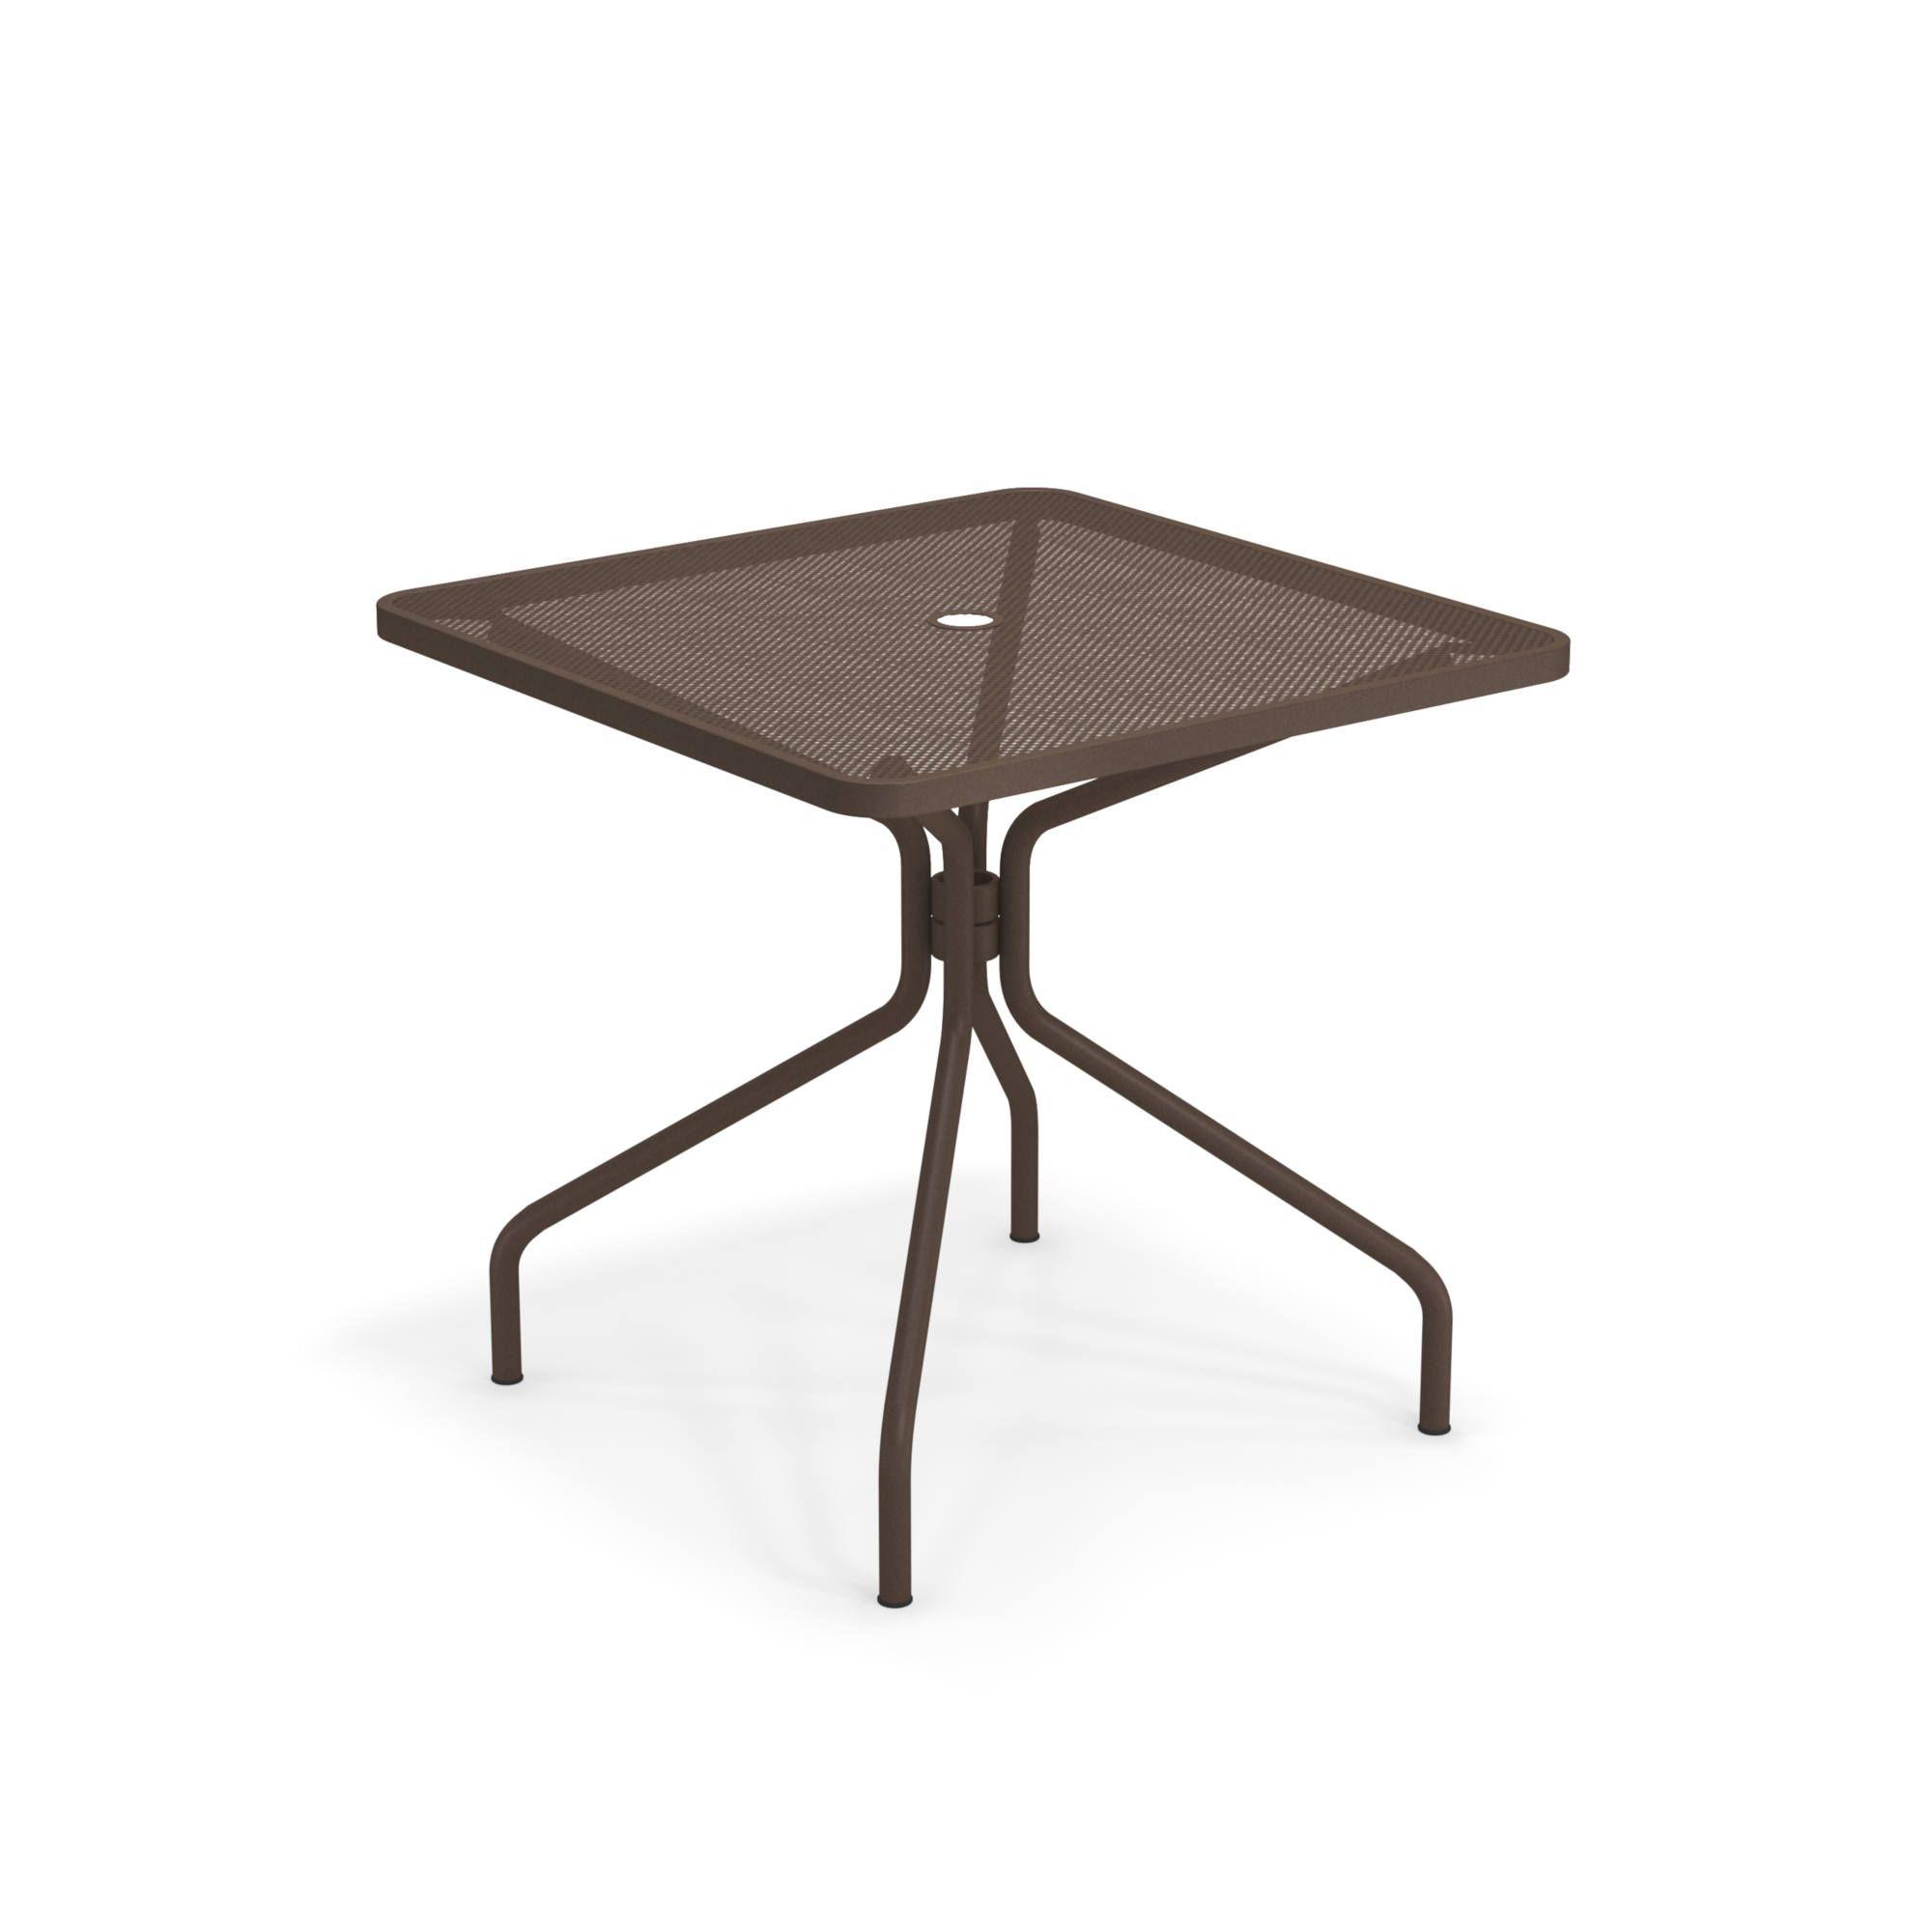 emuamericas, llc 801-41 table, outdoor